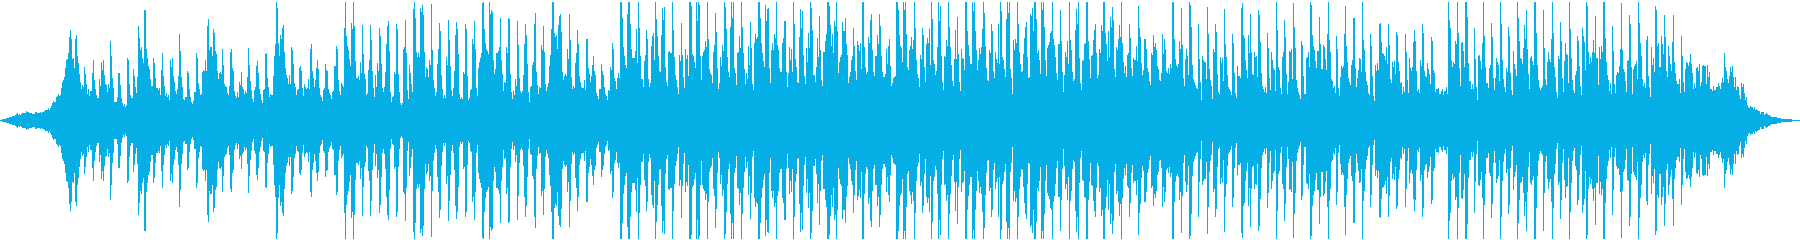 Intelligent Corporatの再生済みの波形